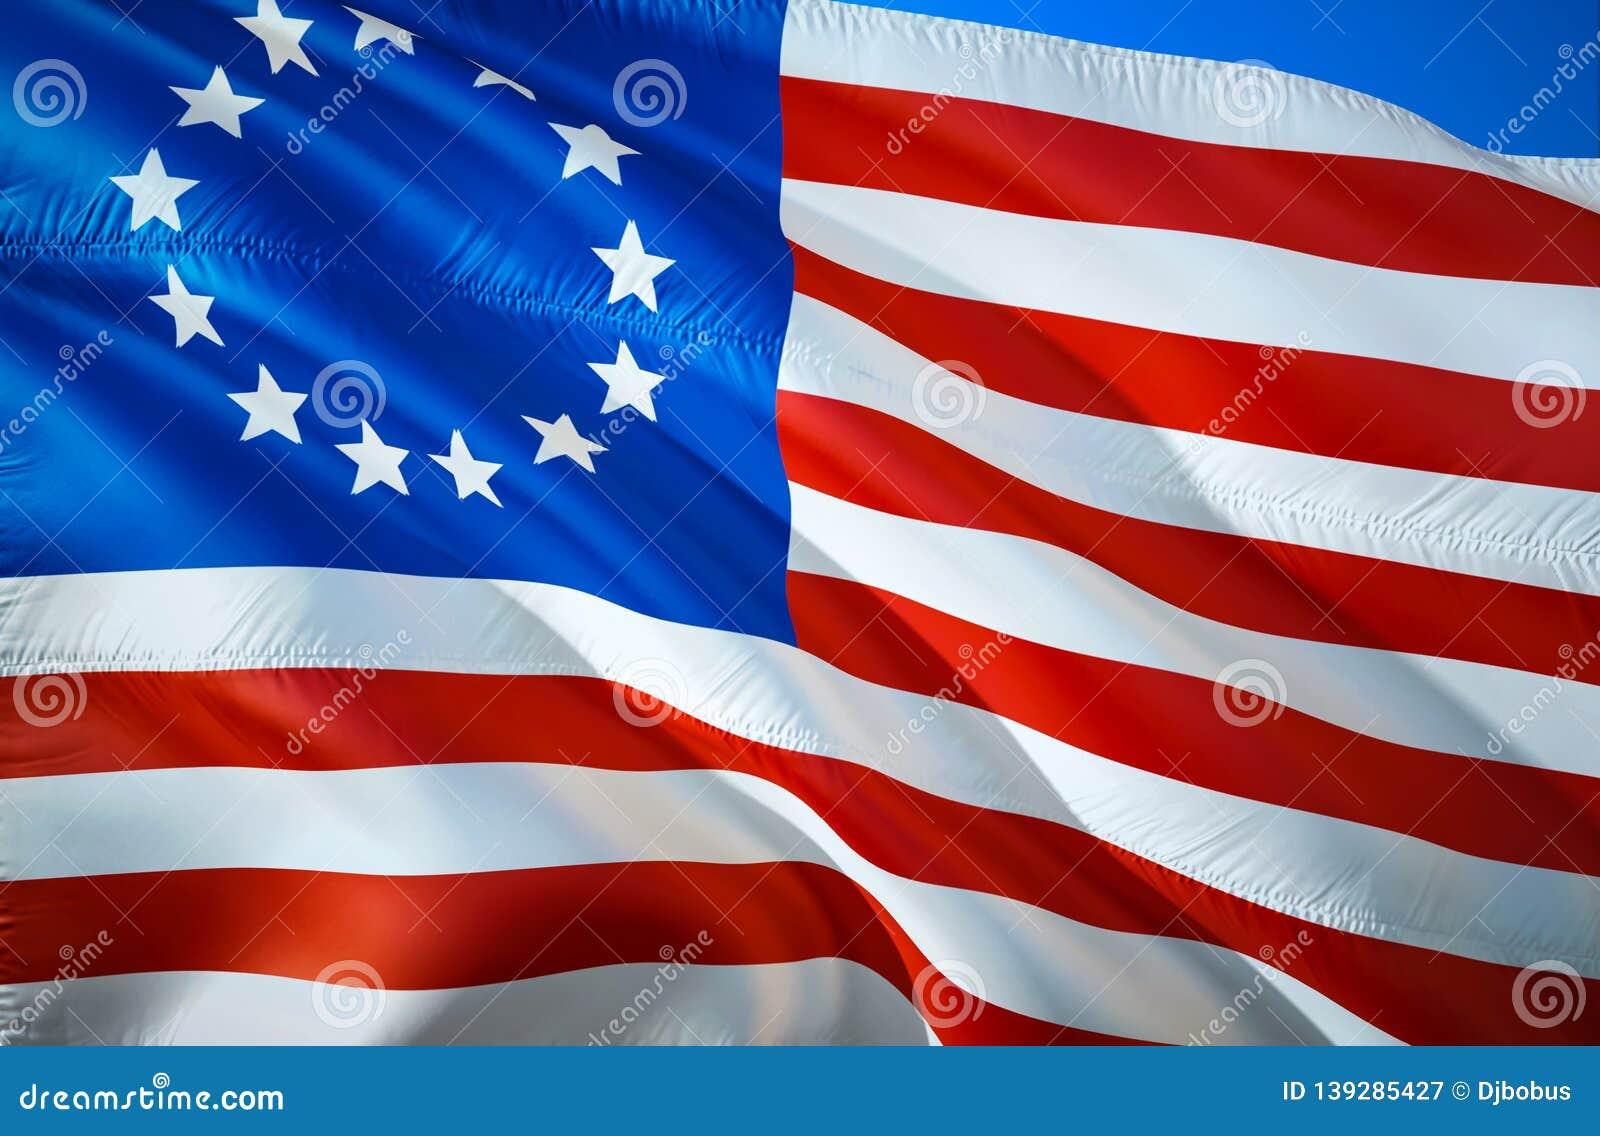 Indicador De Betsy Ross Diseno De La Bandera Que Agita 3d El